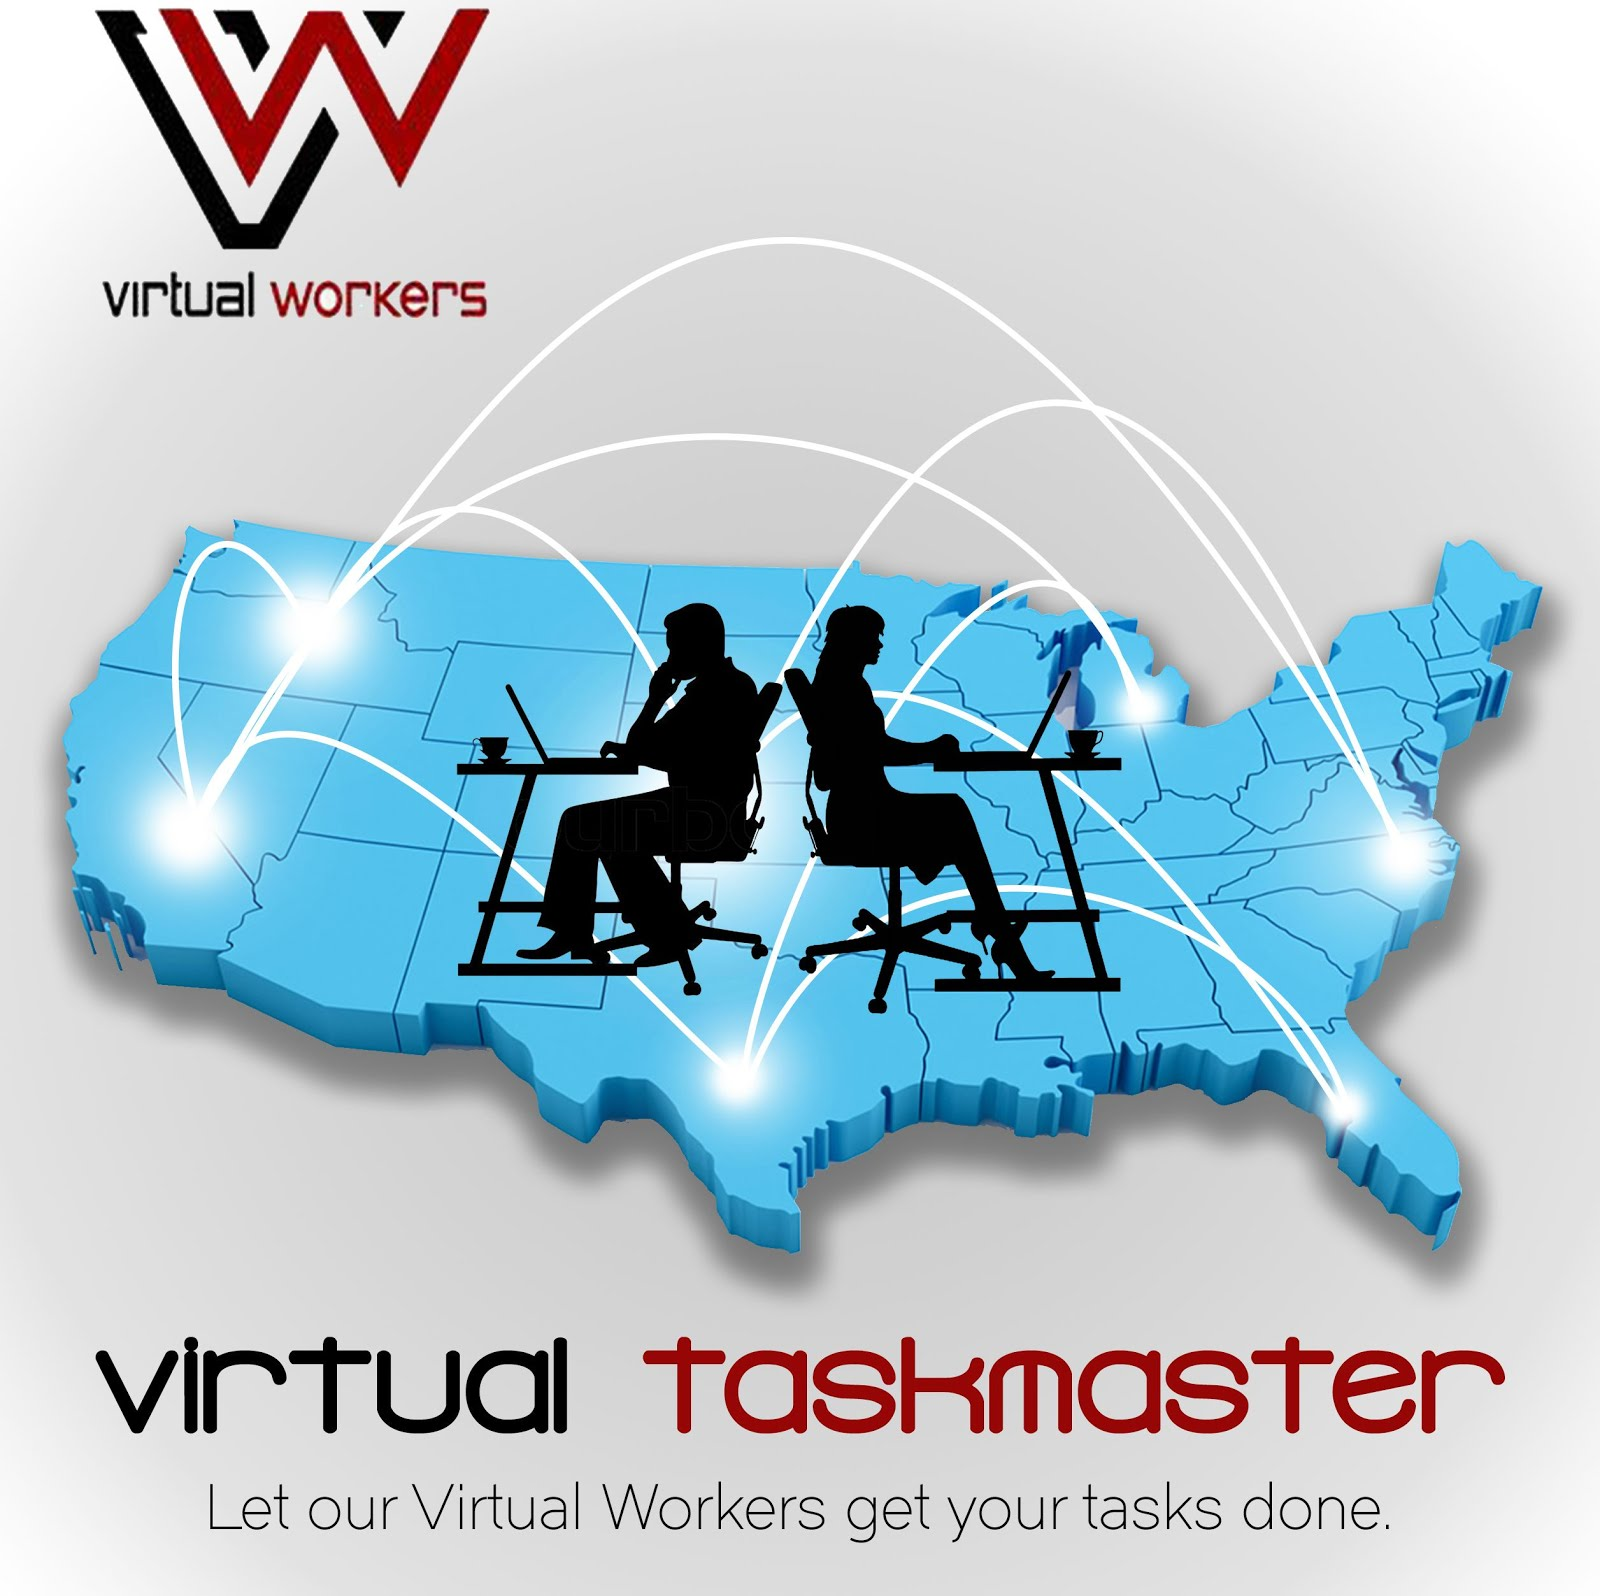 Virtual Taskmaster